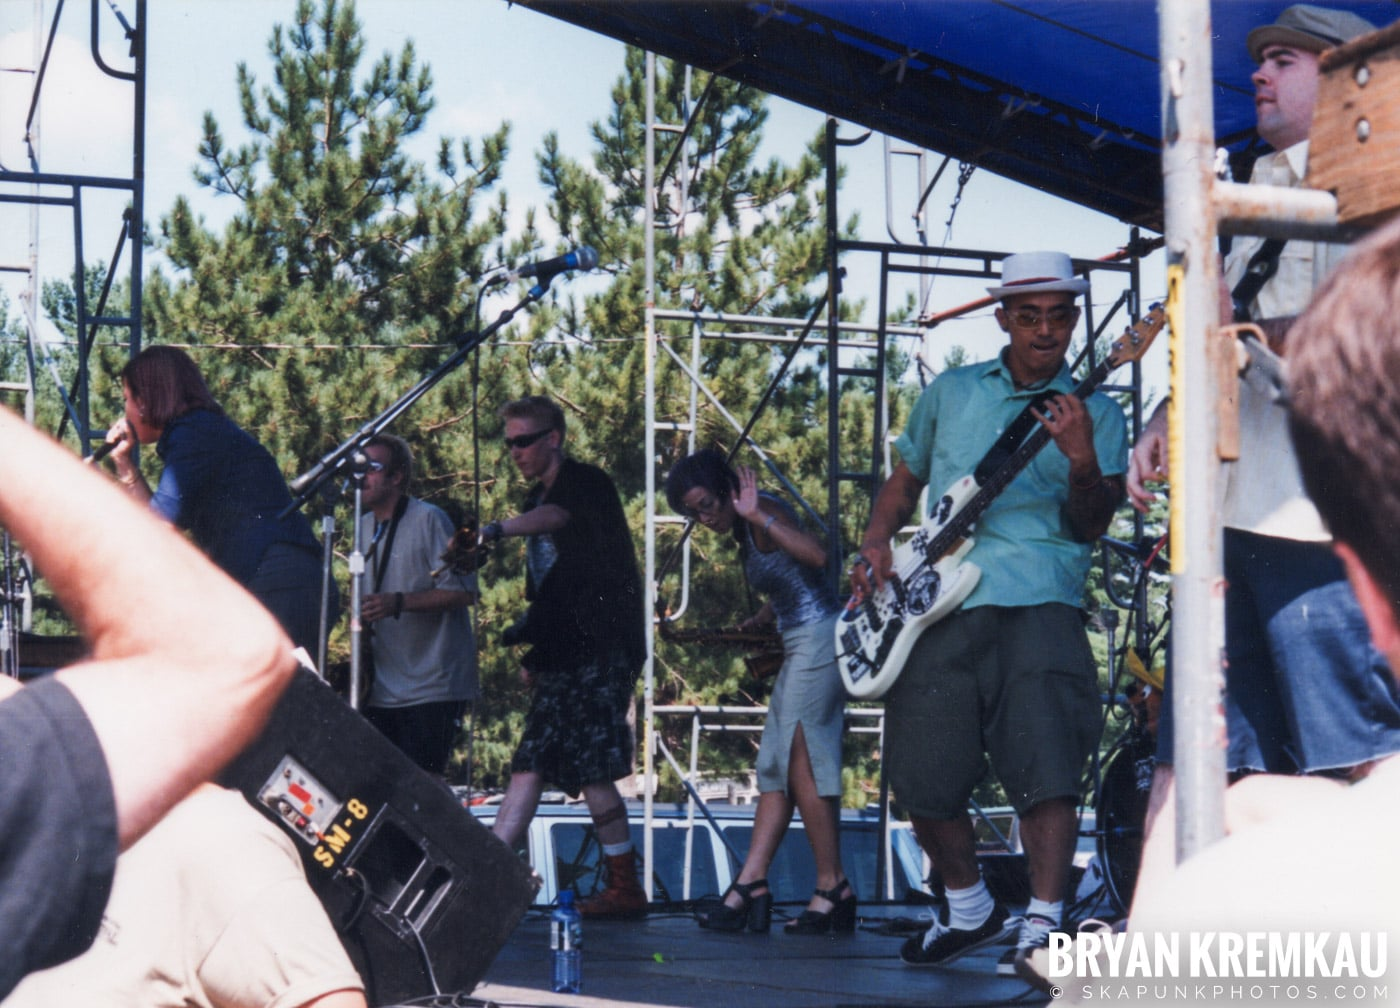 Metro Stylee @ New England Ska Fest 98, Westford, MA - 8.22.98 (1)